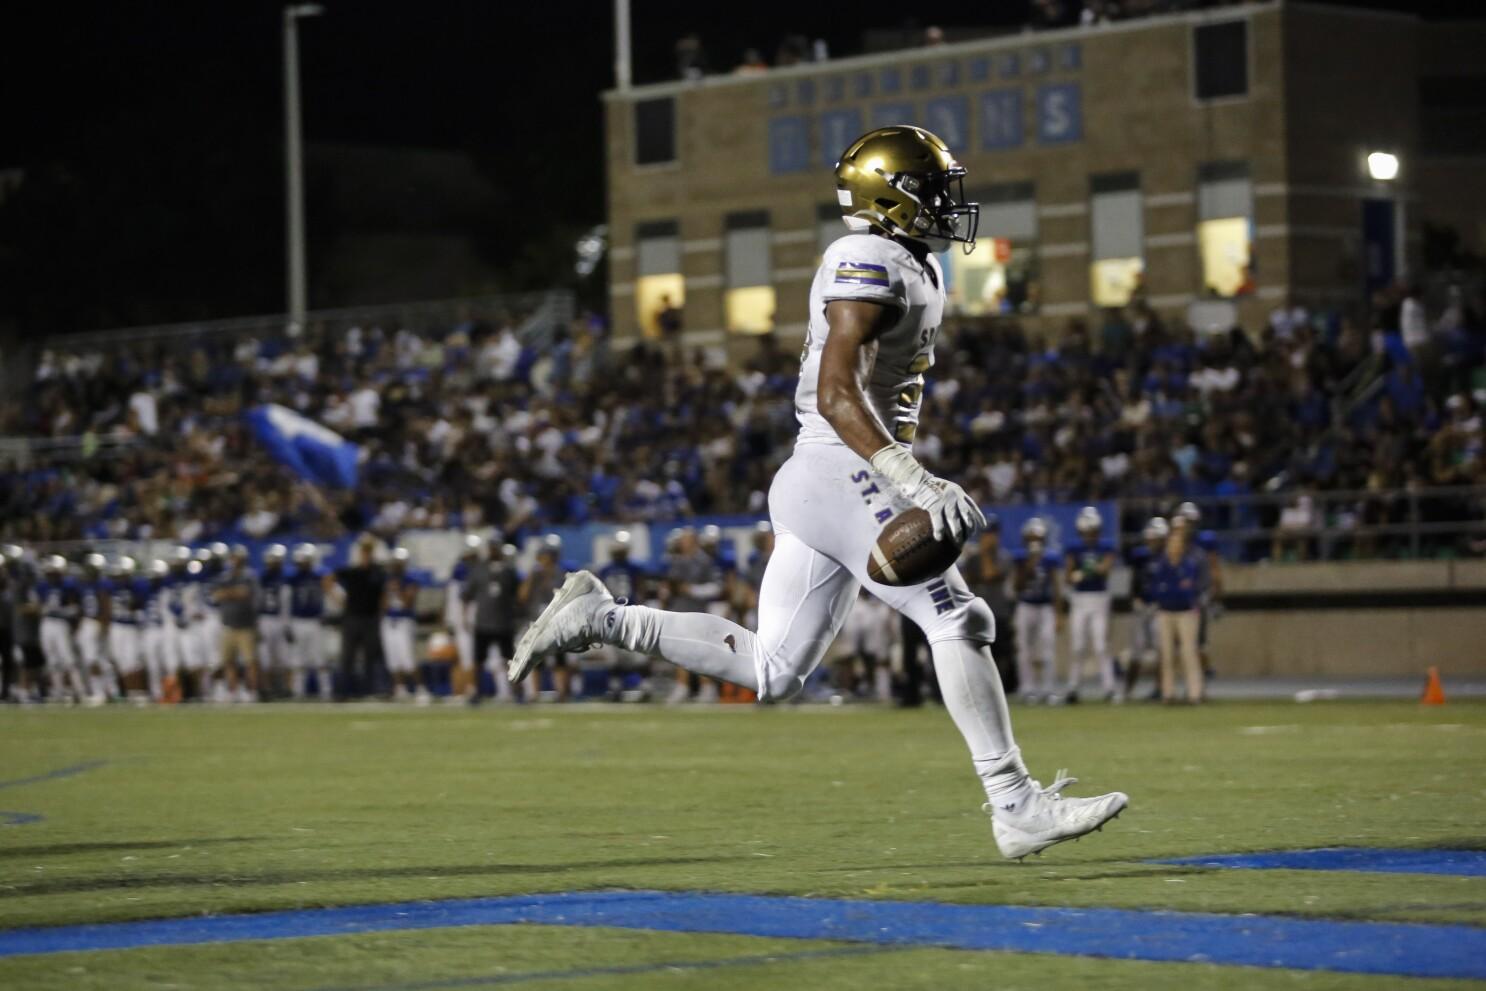 Saints junior's big plays turn tide against Hornets